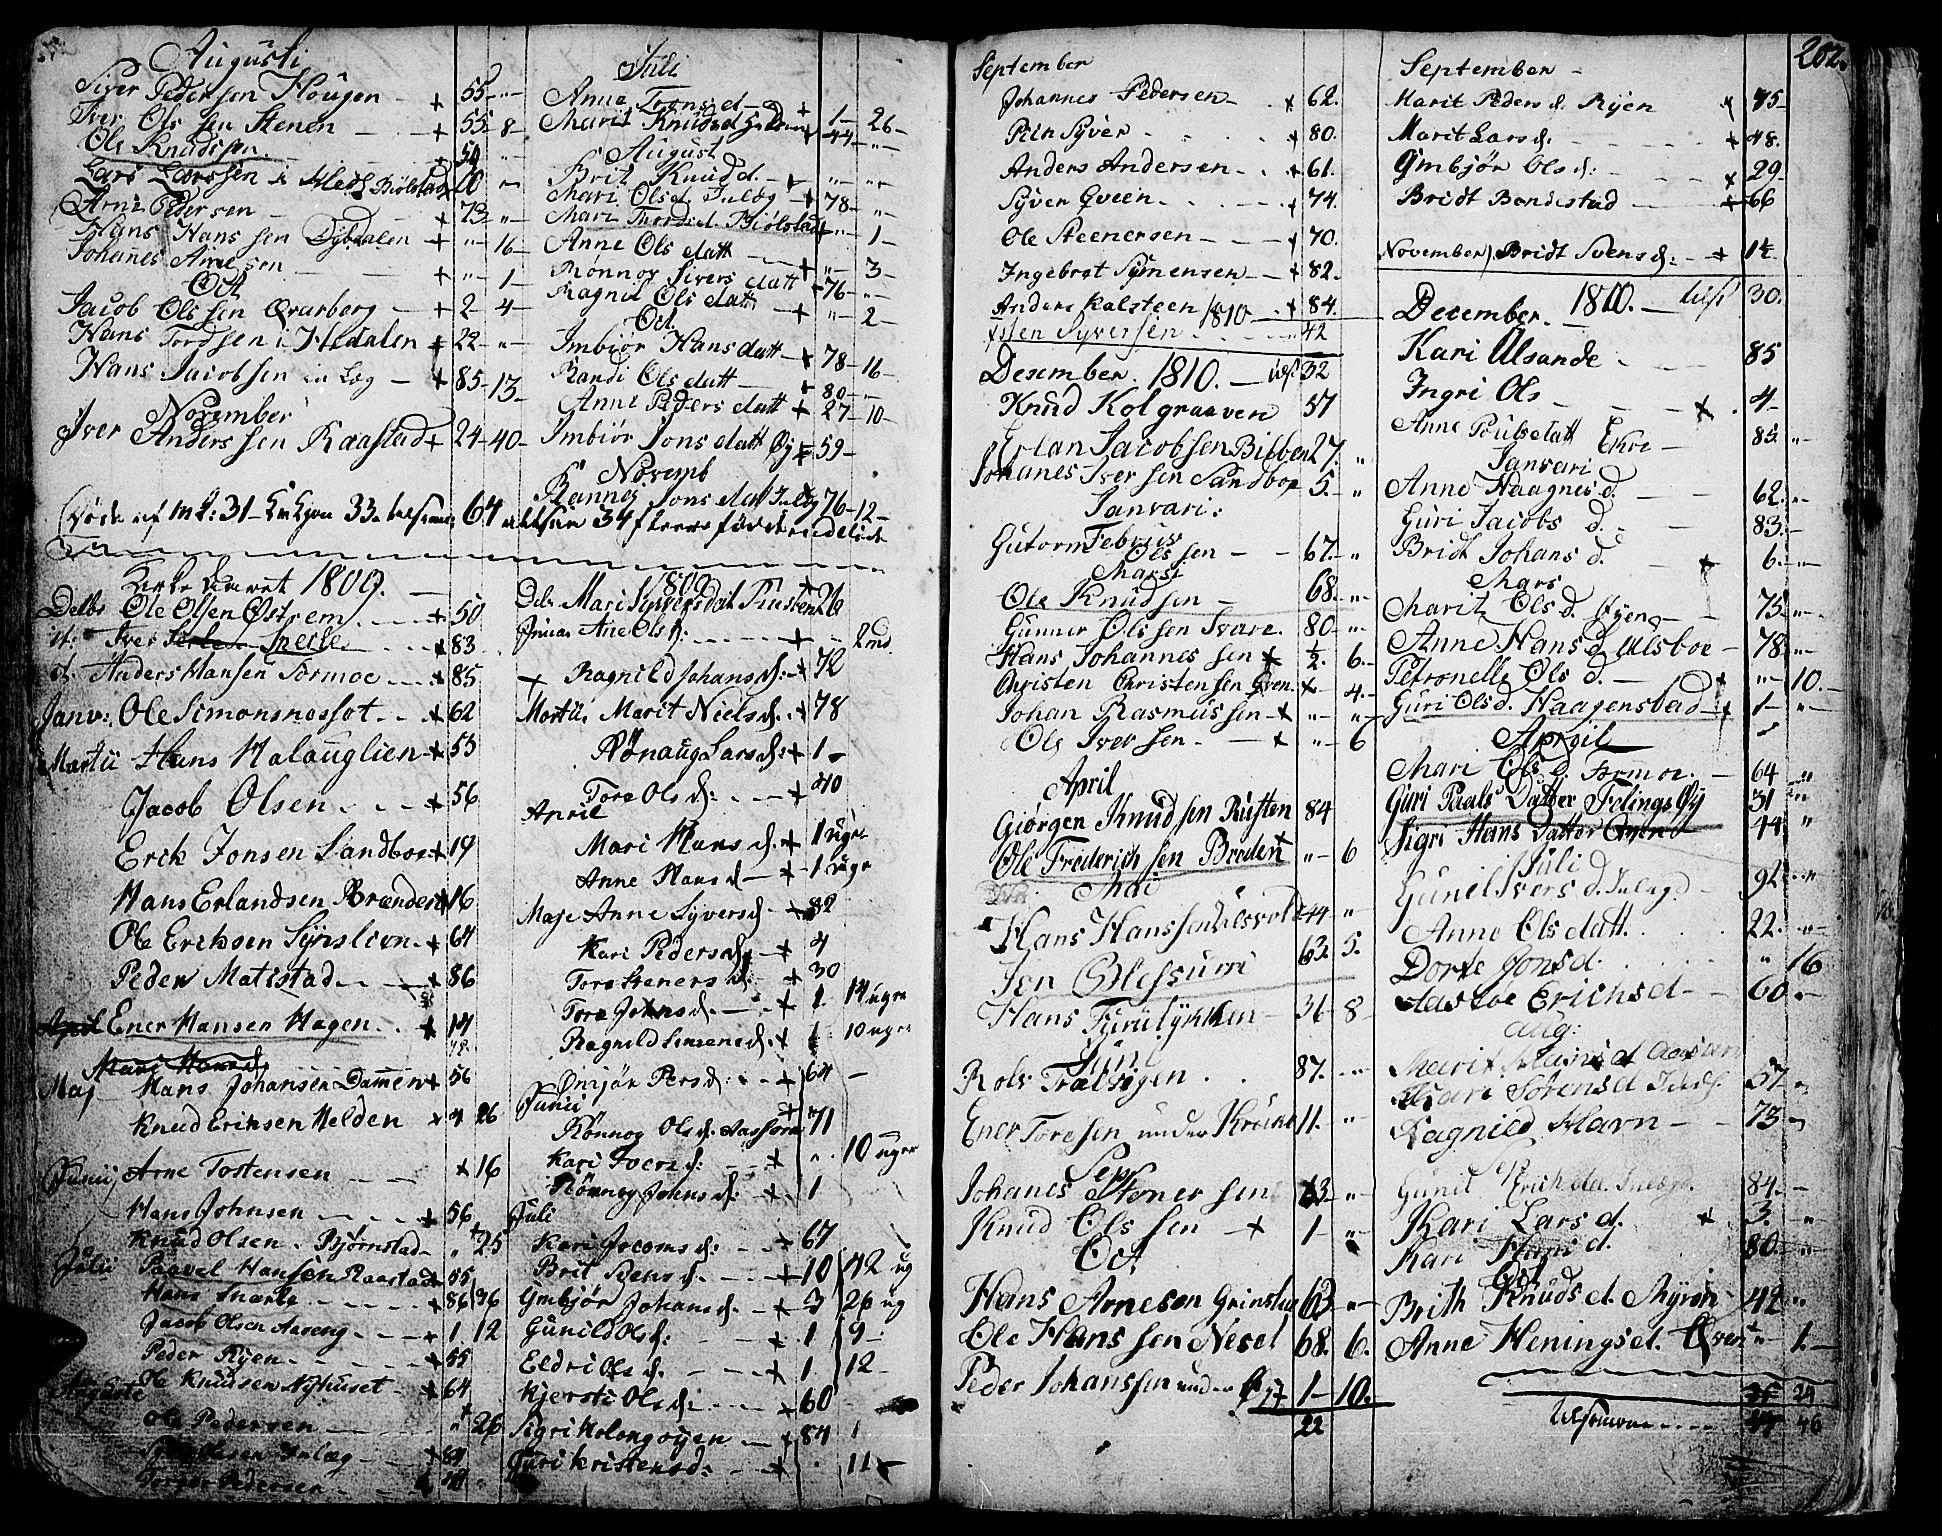 SAH, Vågå prestekontor, Ministerialbok nr. 1, 1739-1810, s. 202